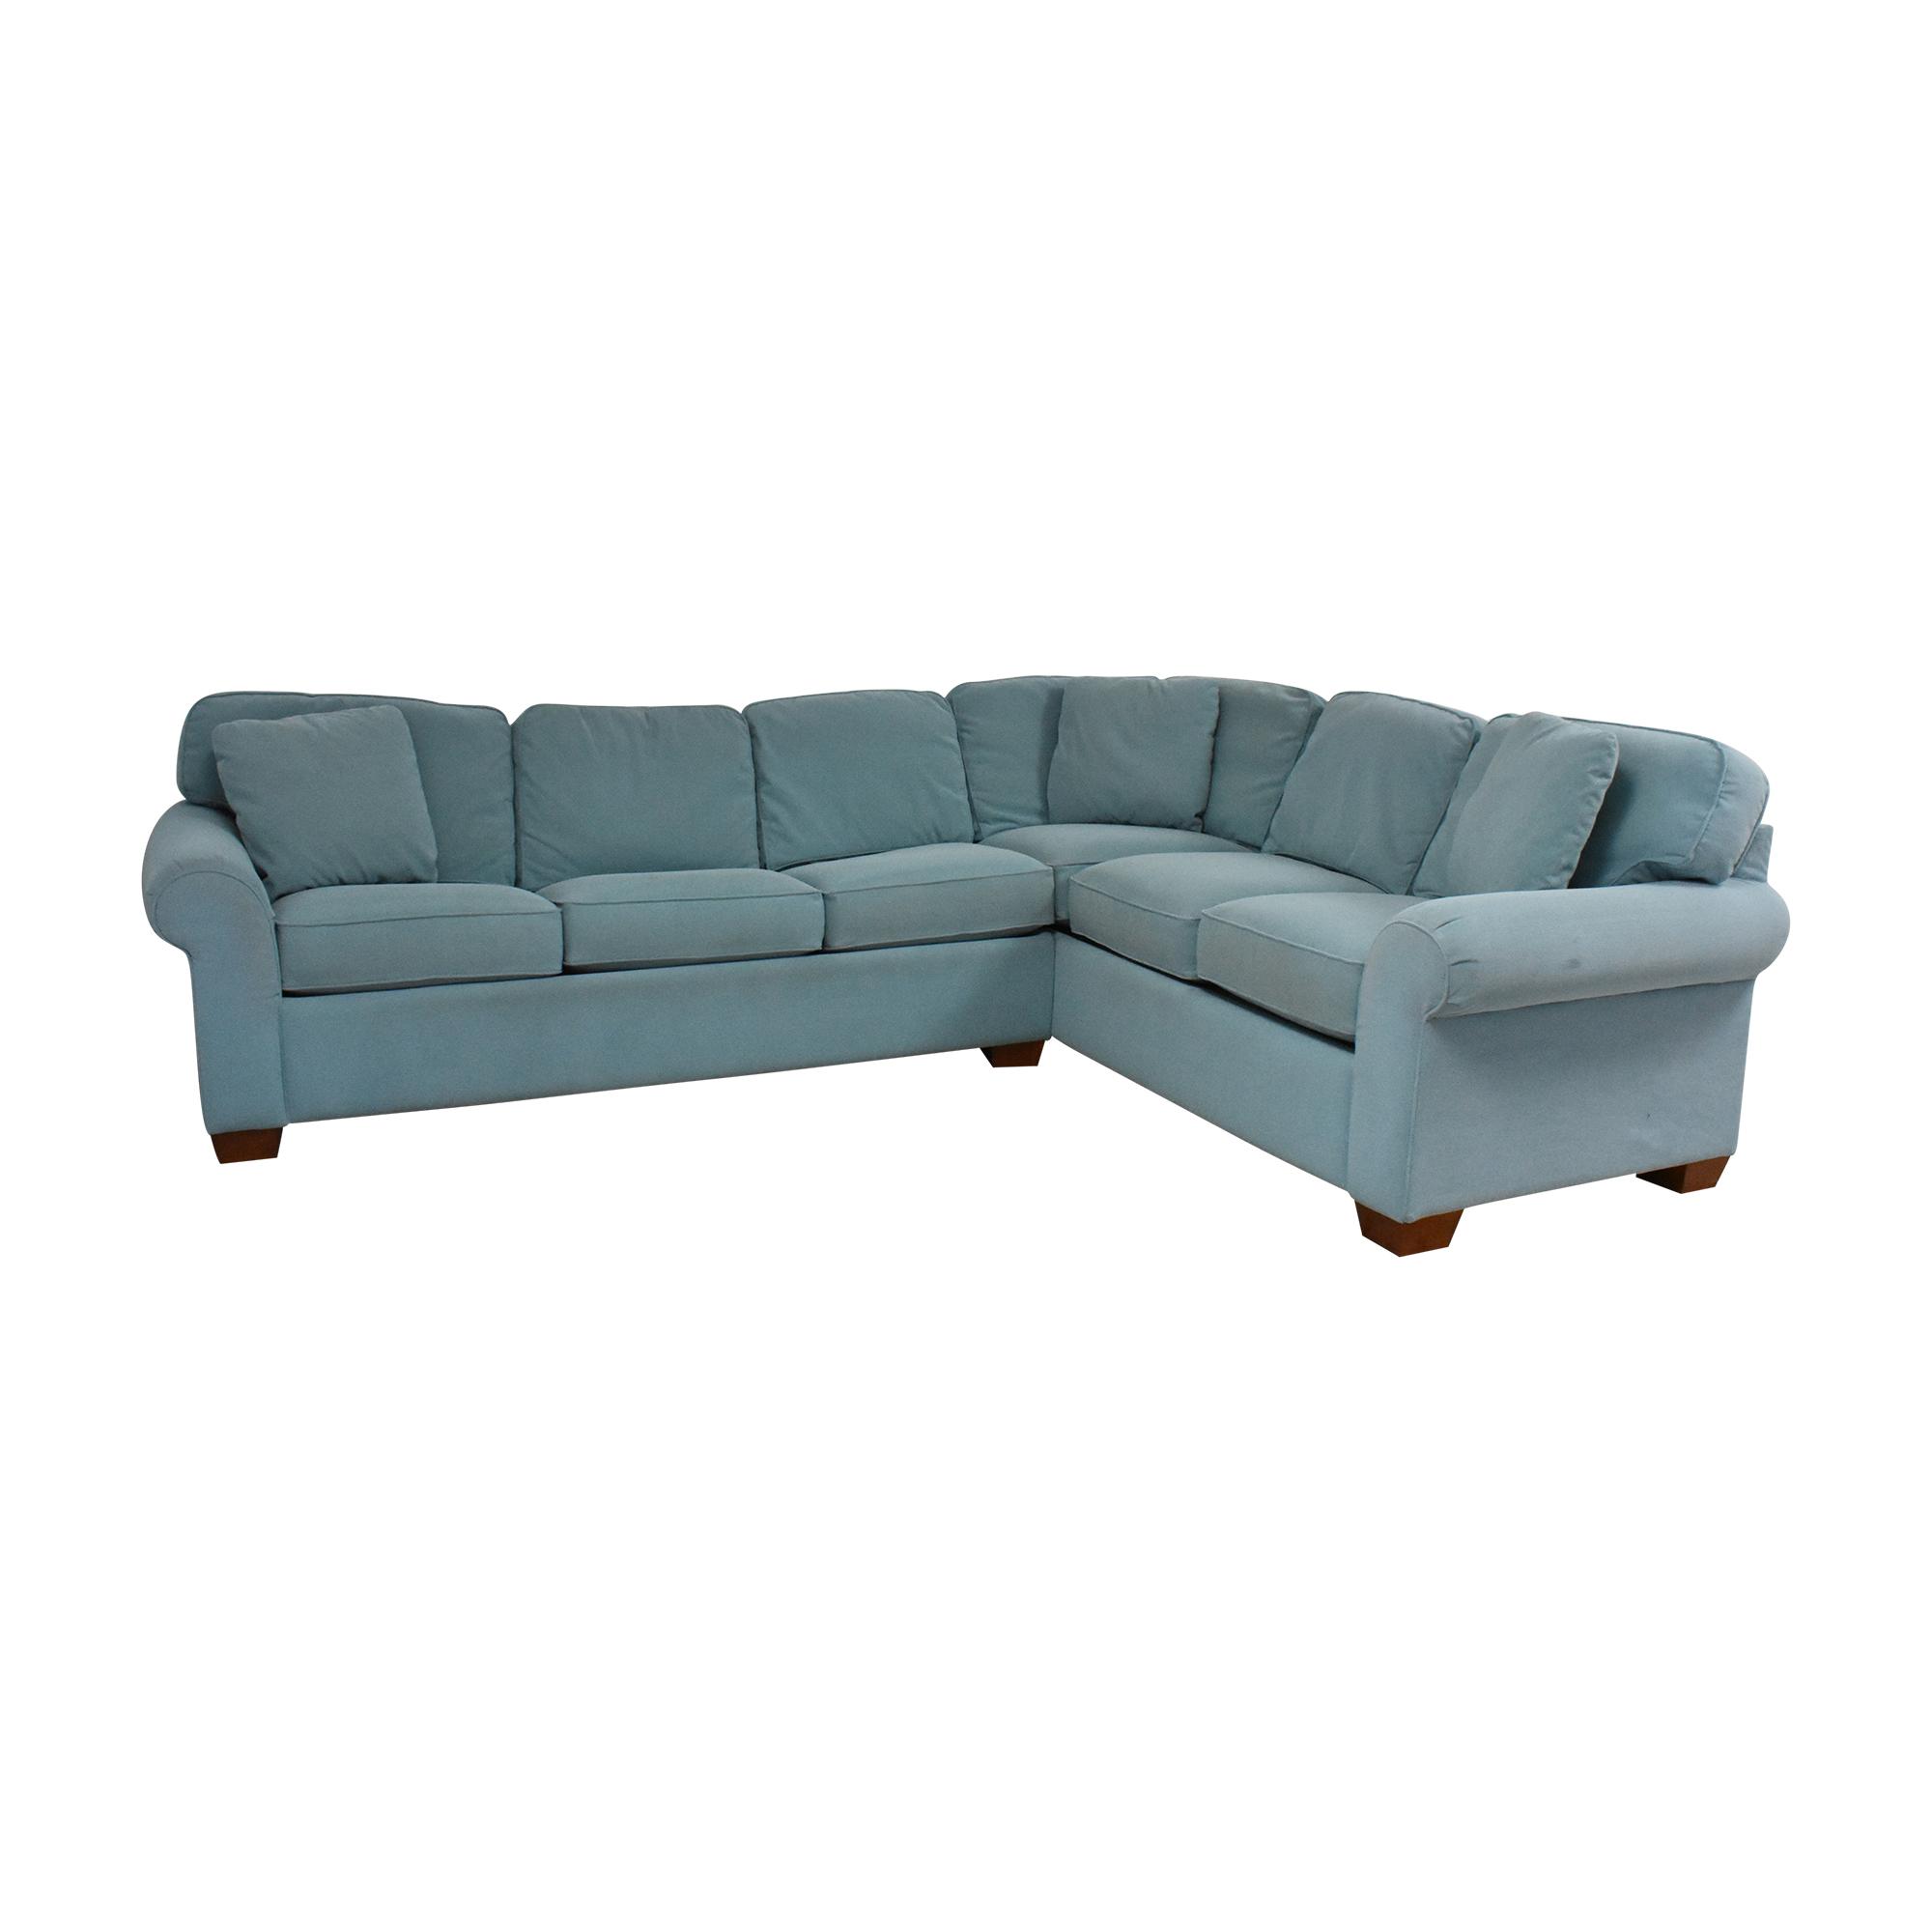 buy La-Z-Boy Corner Sectional Sleeper Sofa La-Z-Boy Sectionals